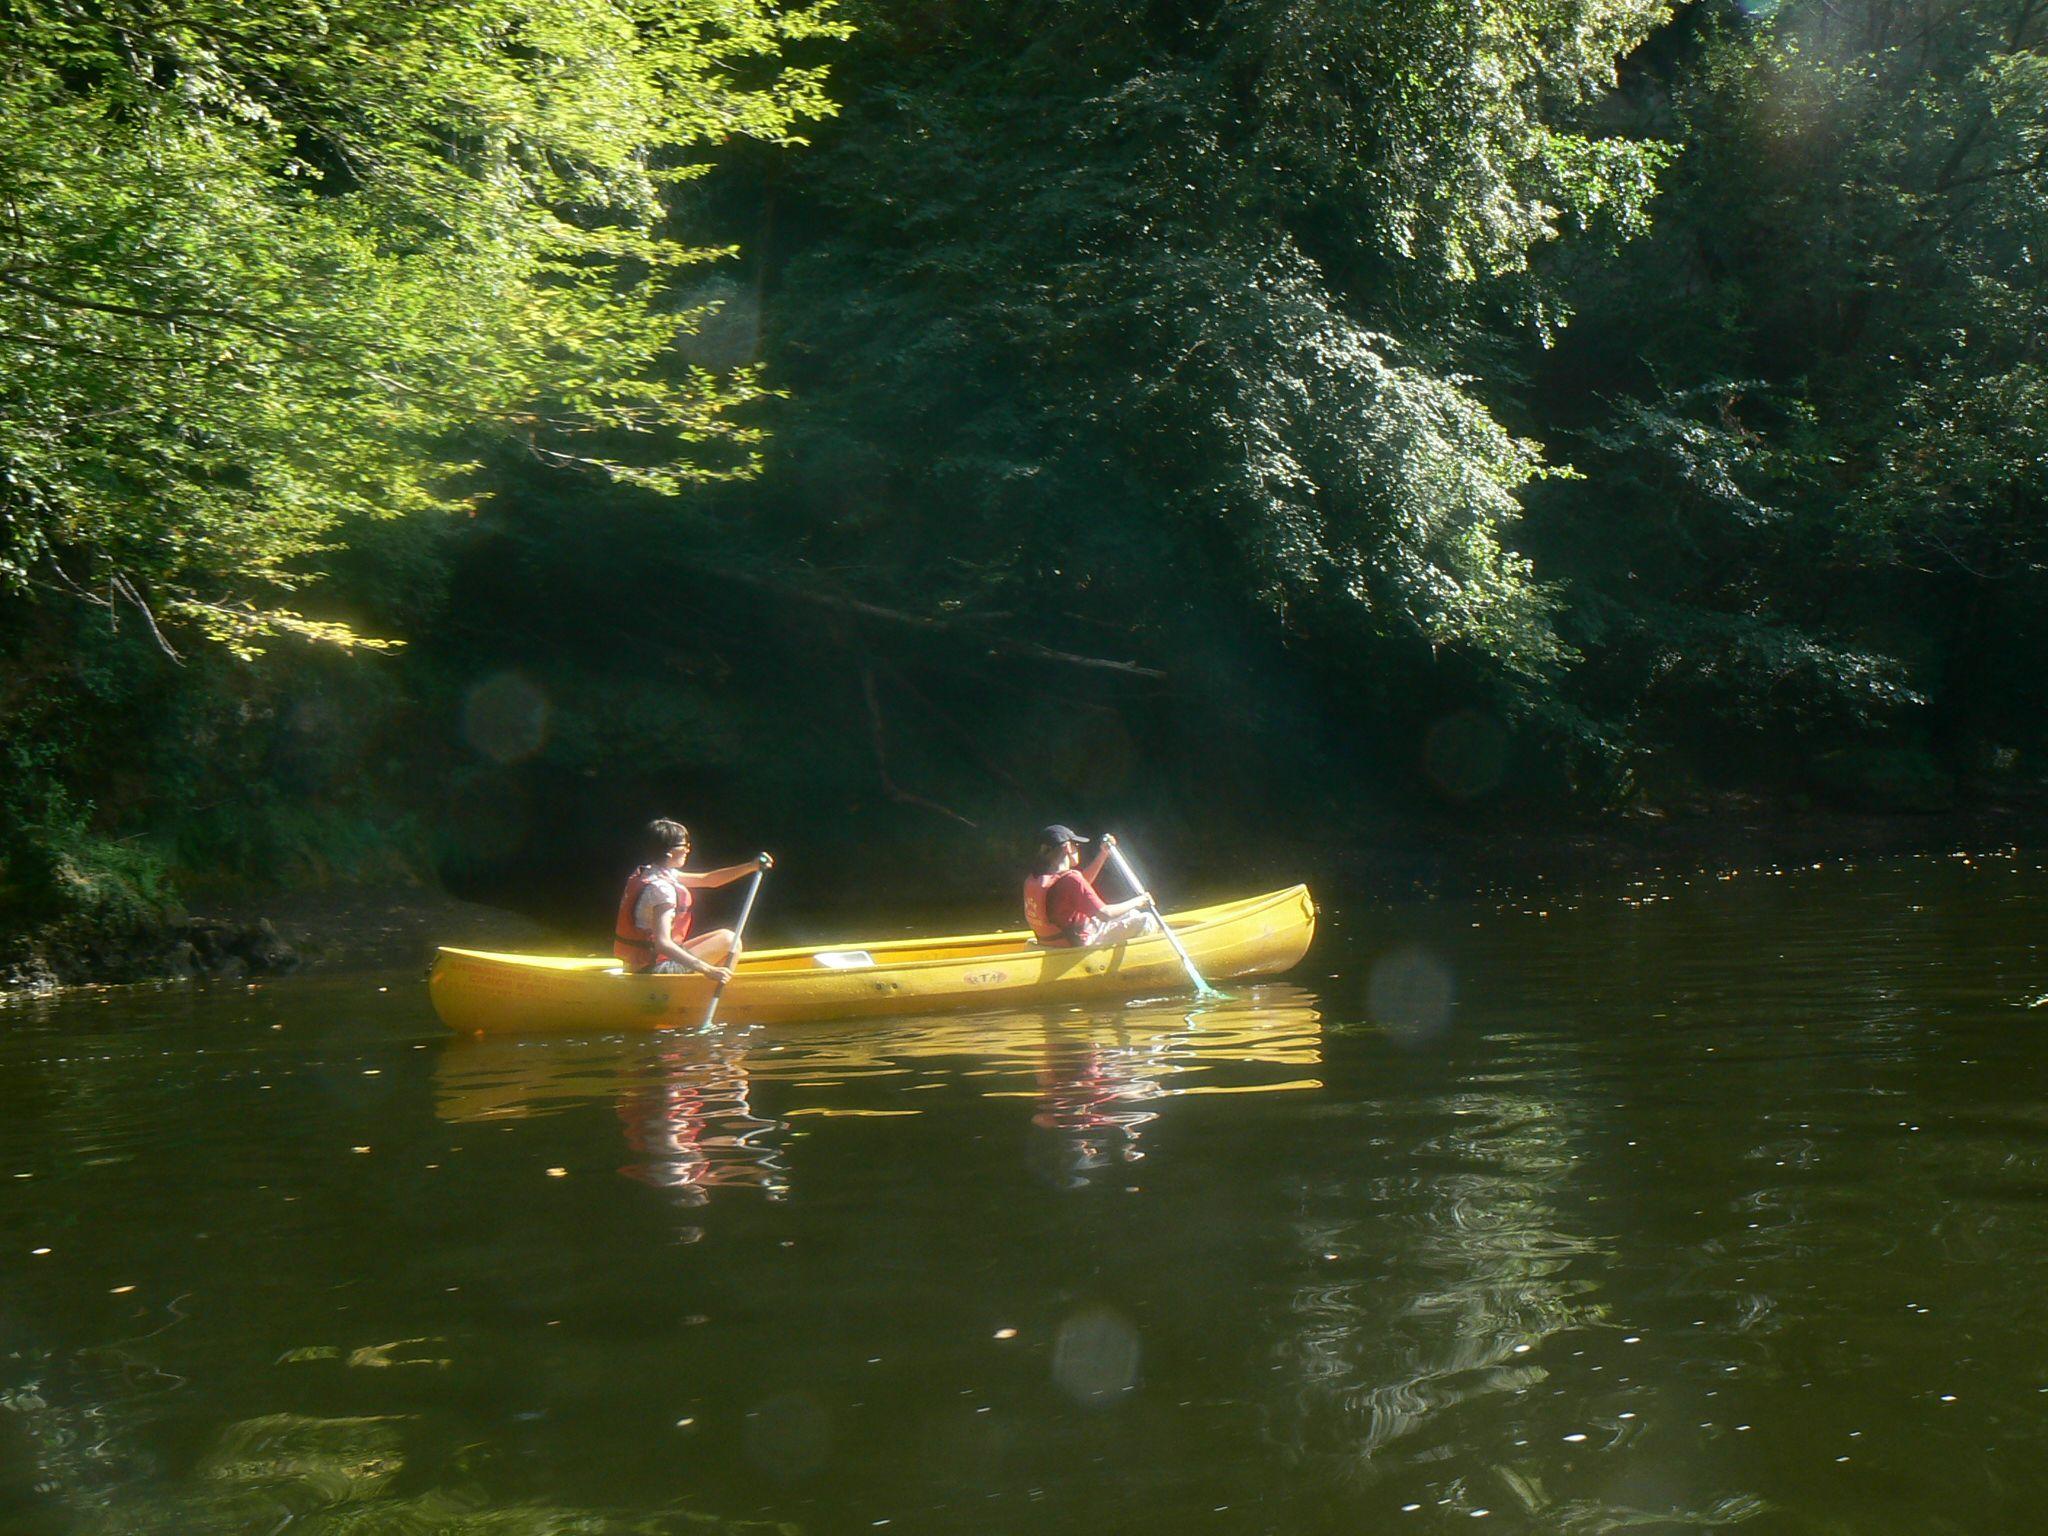 Canoes on the Vézère river